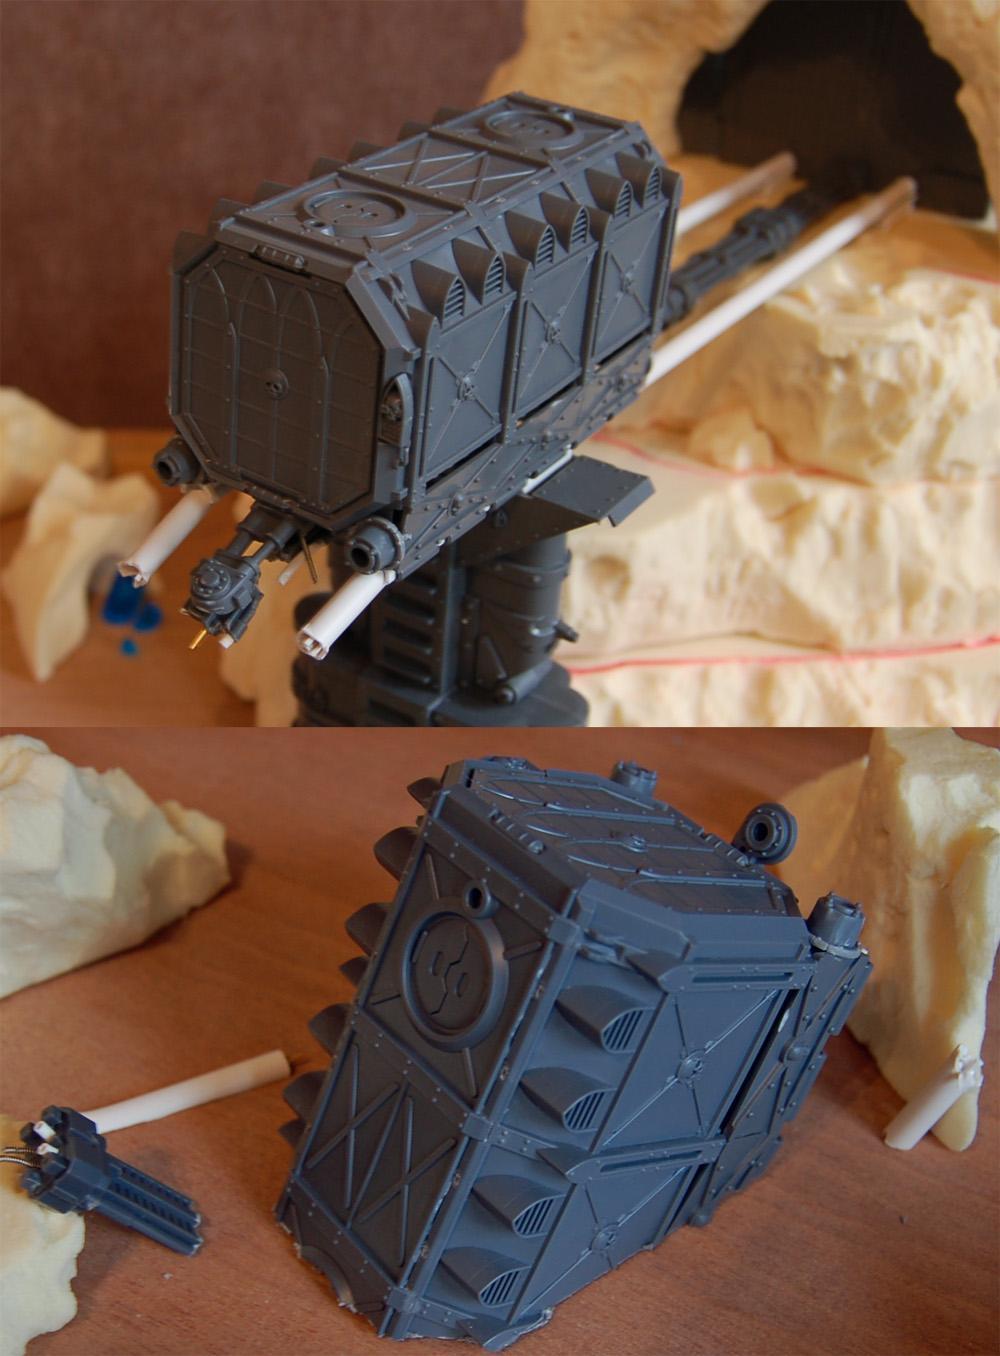 Armies On Parade, Container, Display, Display Board, Grav-train, Train, Warhammer 40,000